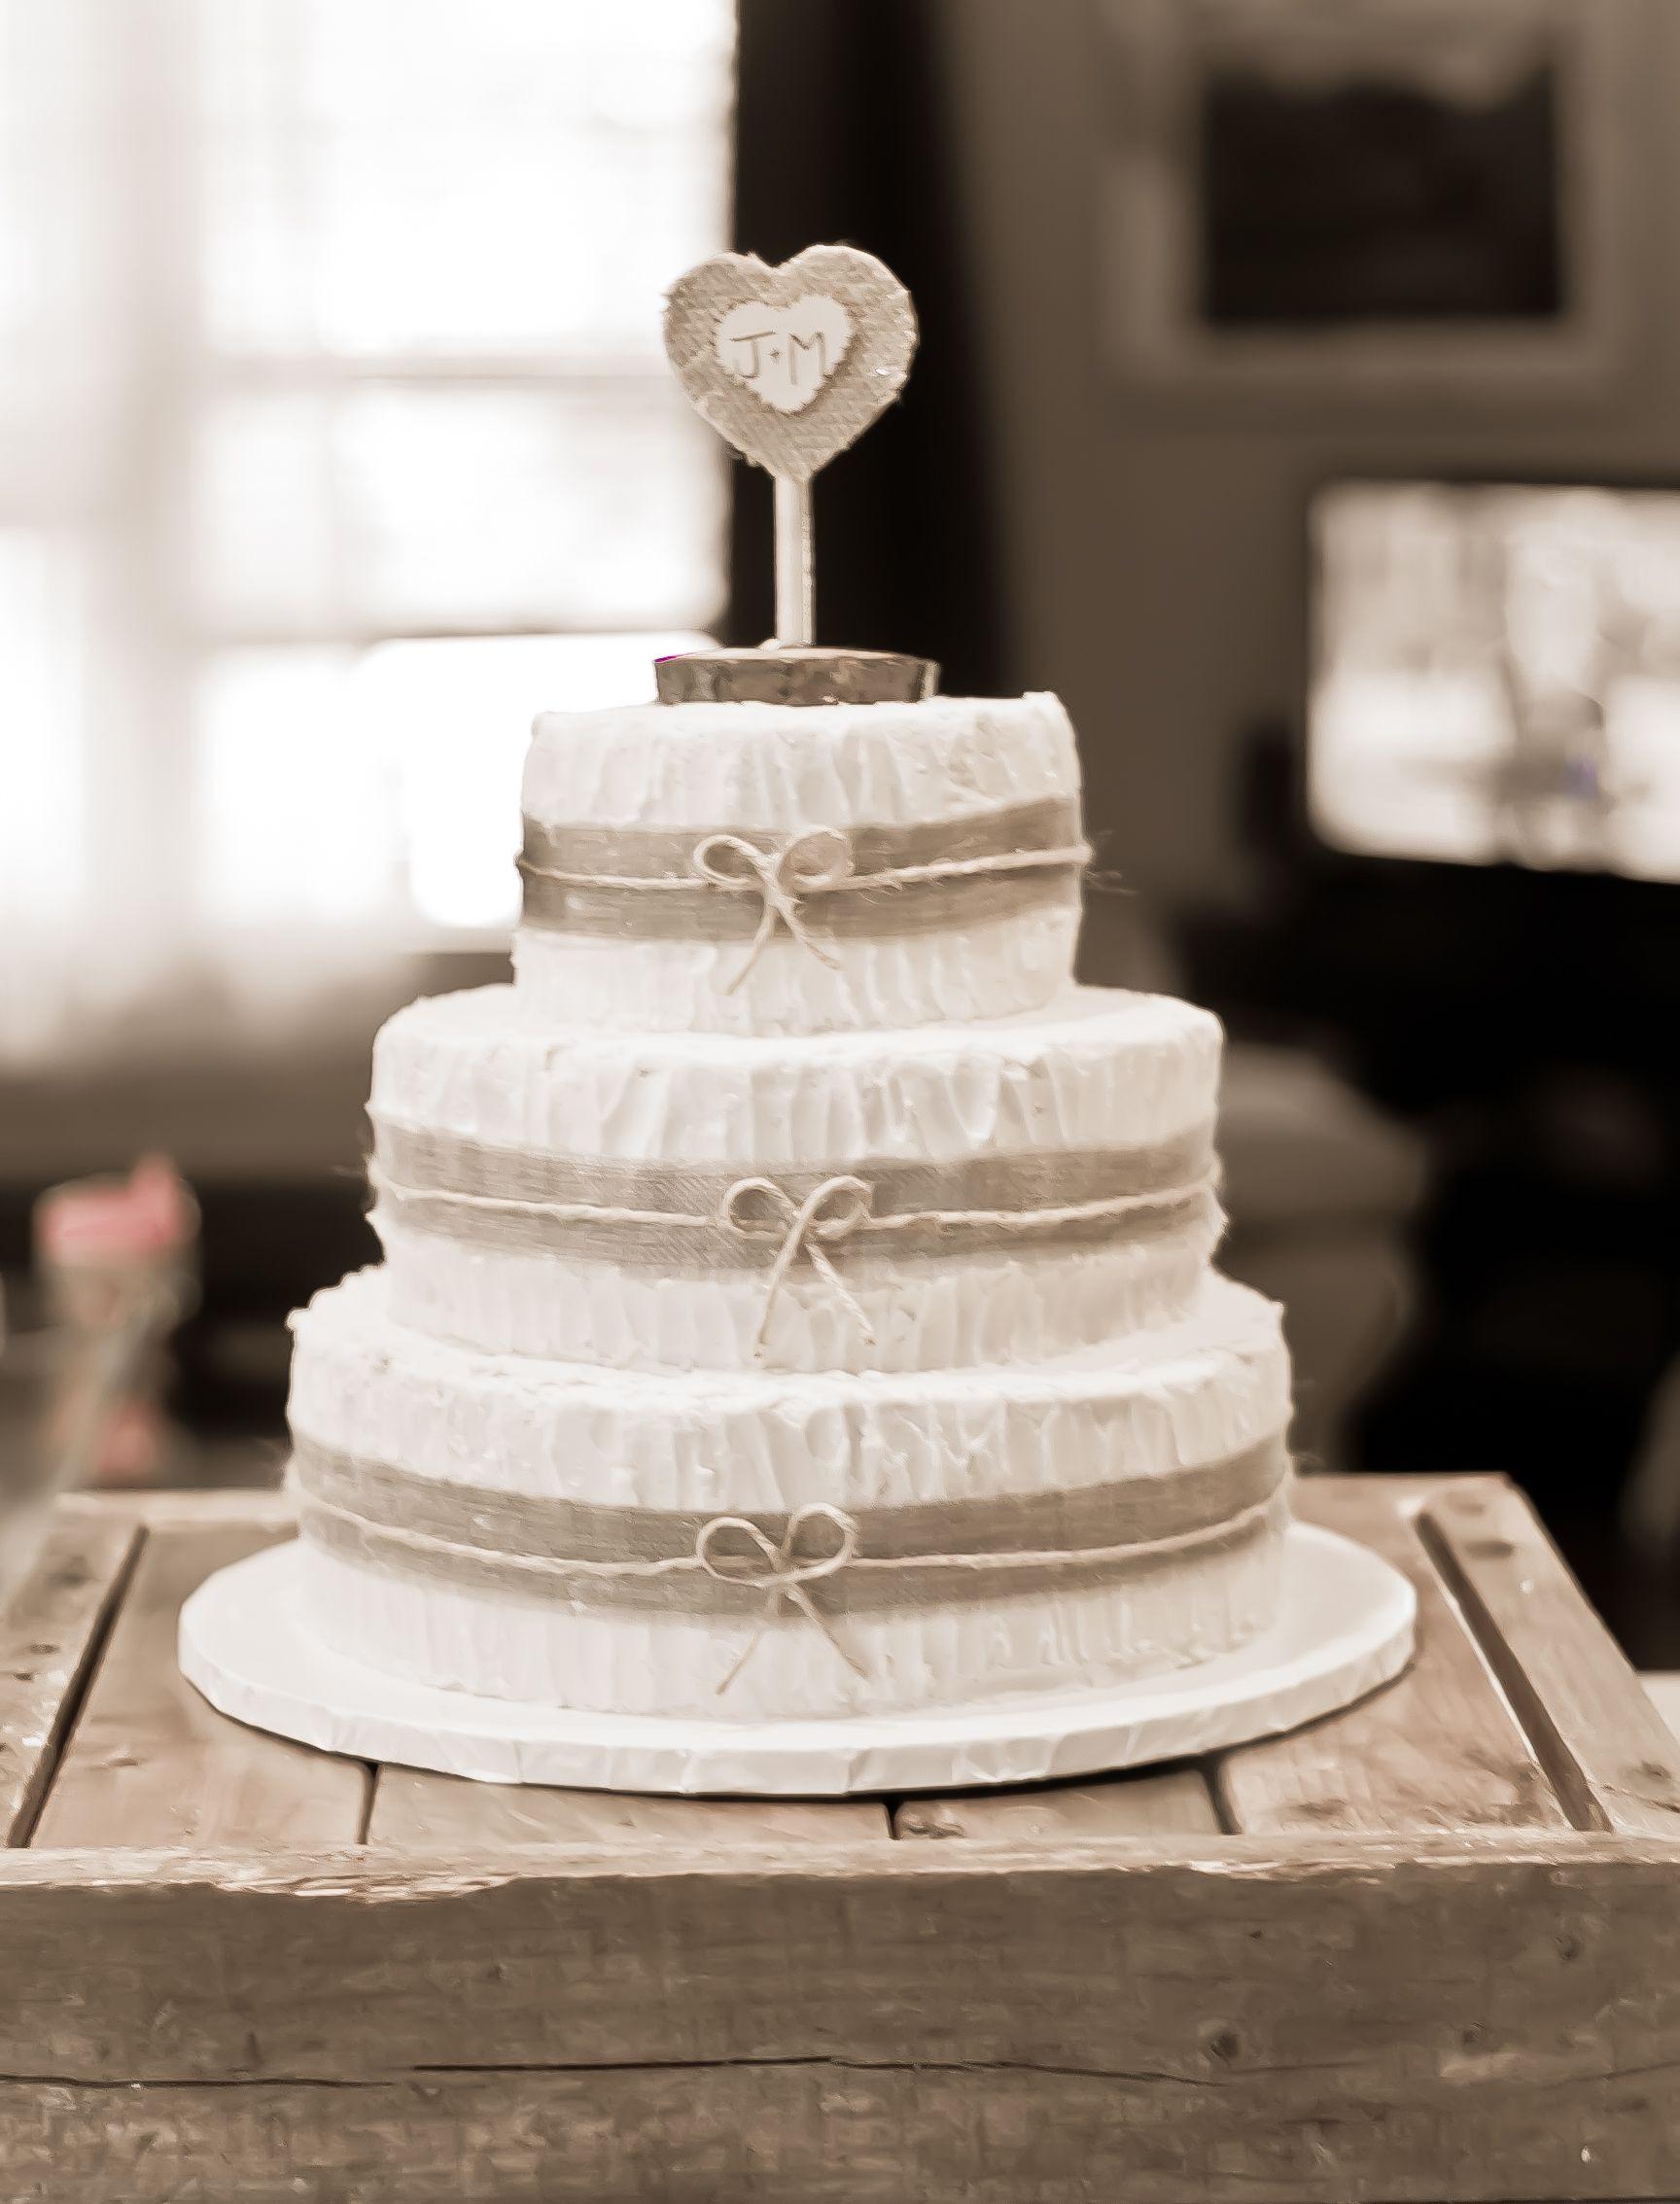 Rustic Wedding Cakes With Burlap  Rustic Burlap Wedding Cake Red